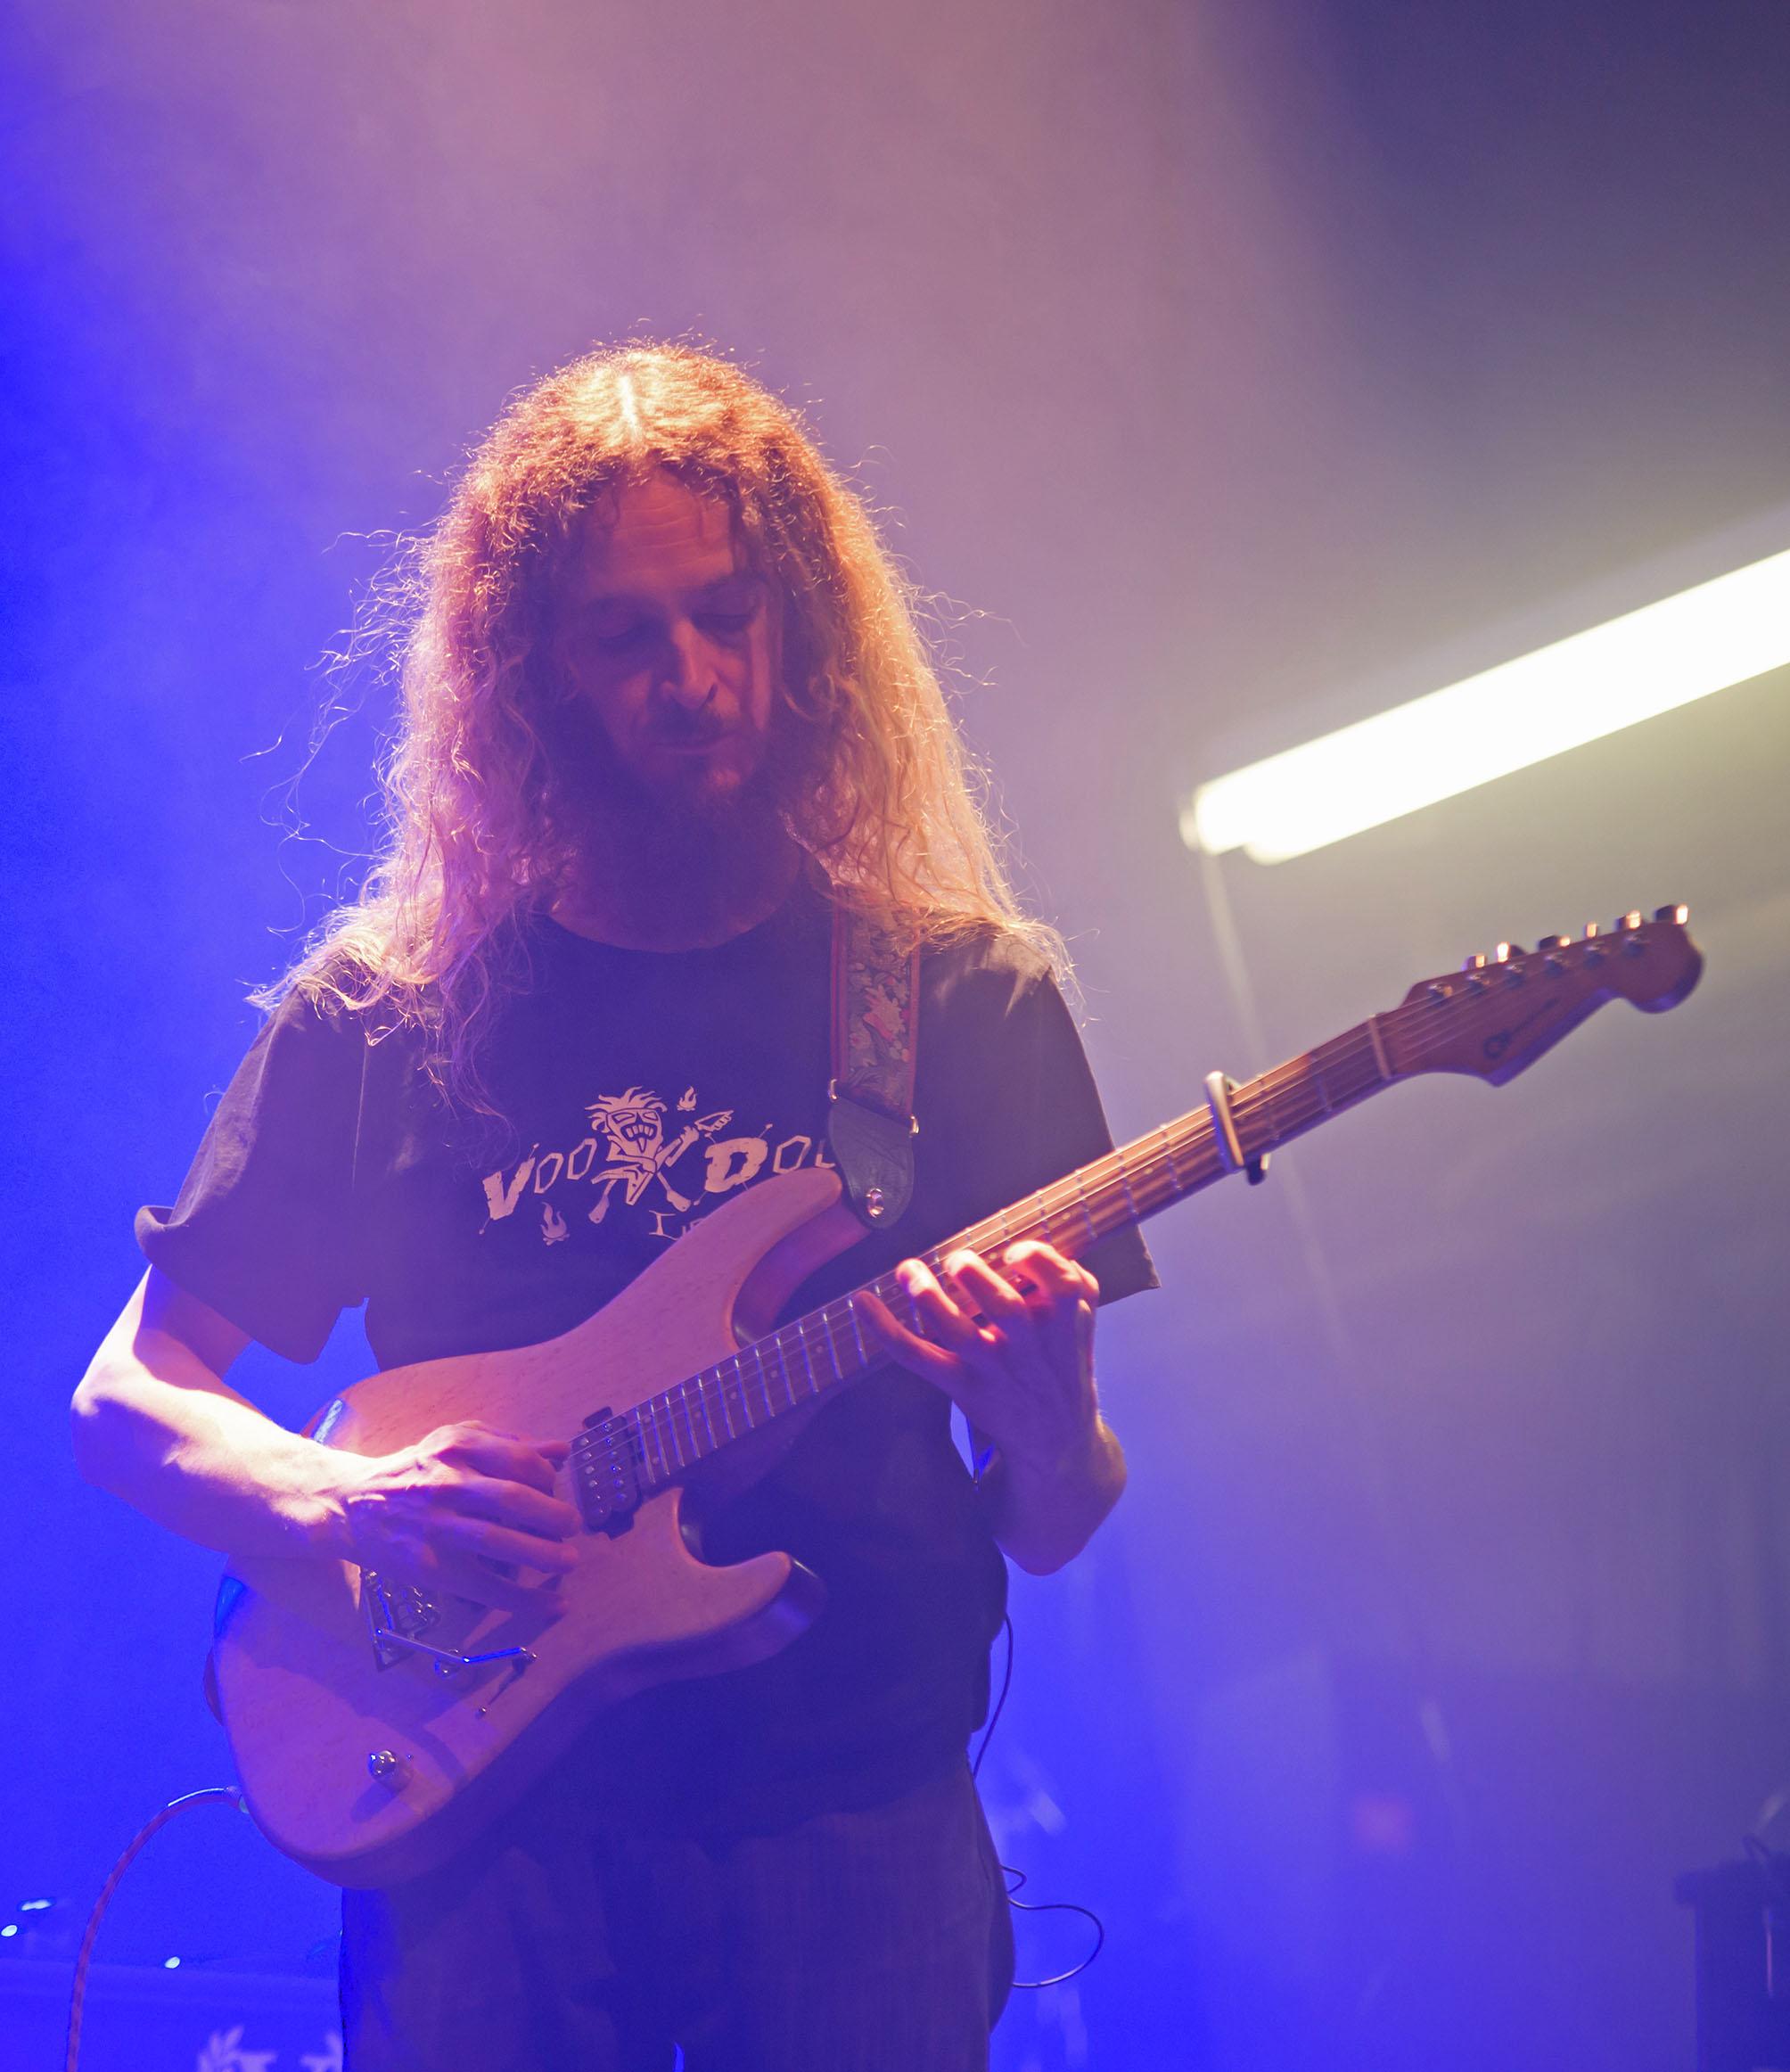 Steven wilson - soundcheck, montreal, april 25, 2013